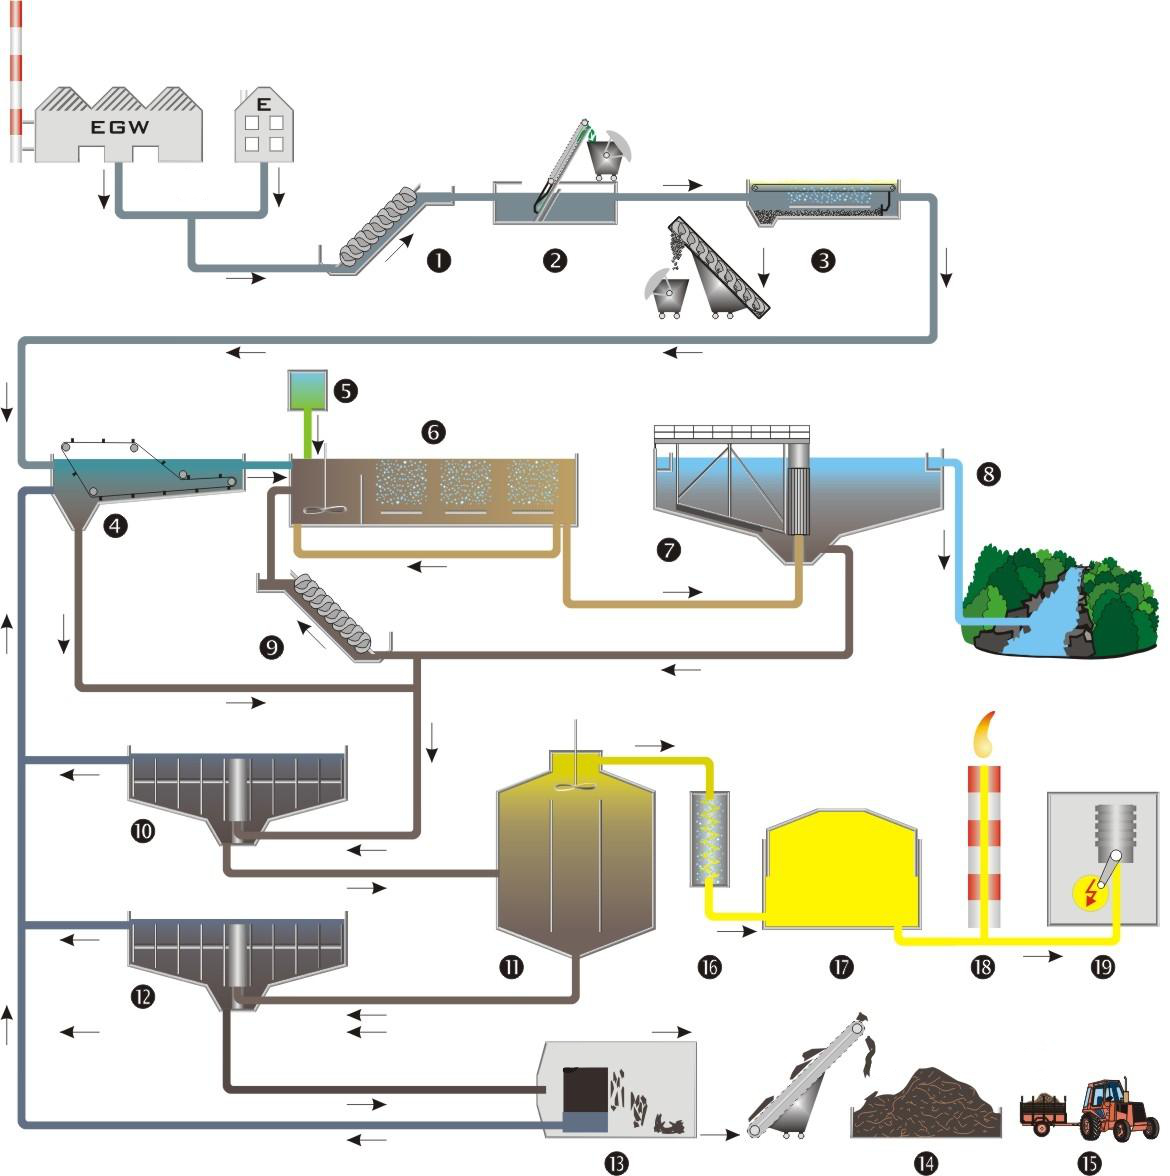 acqu_04_schema_depuratore-impiantobiologico